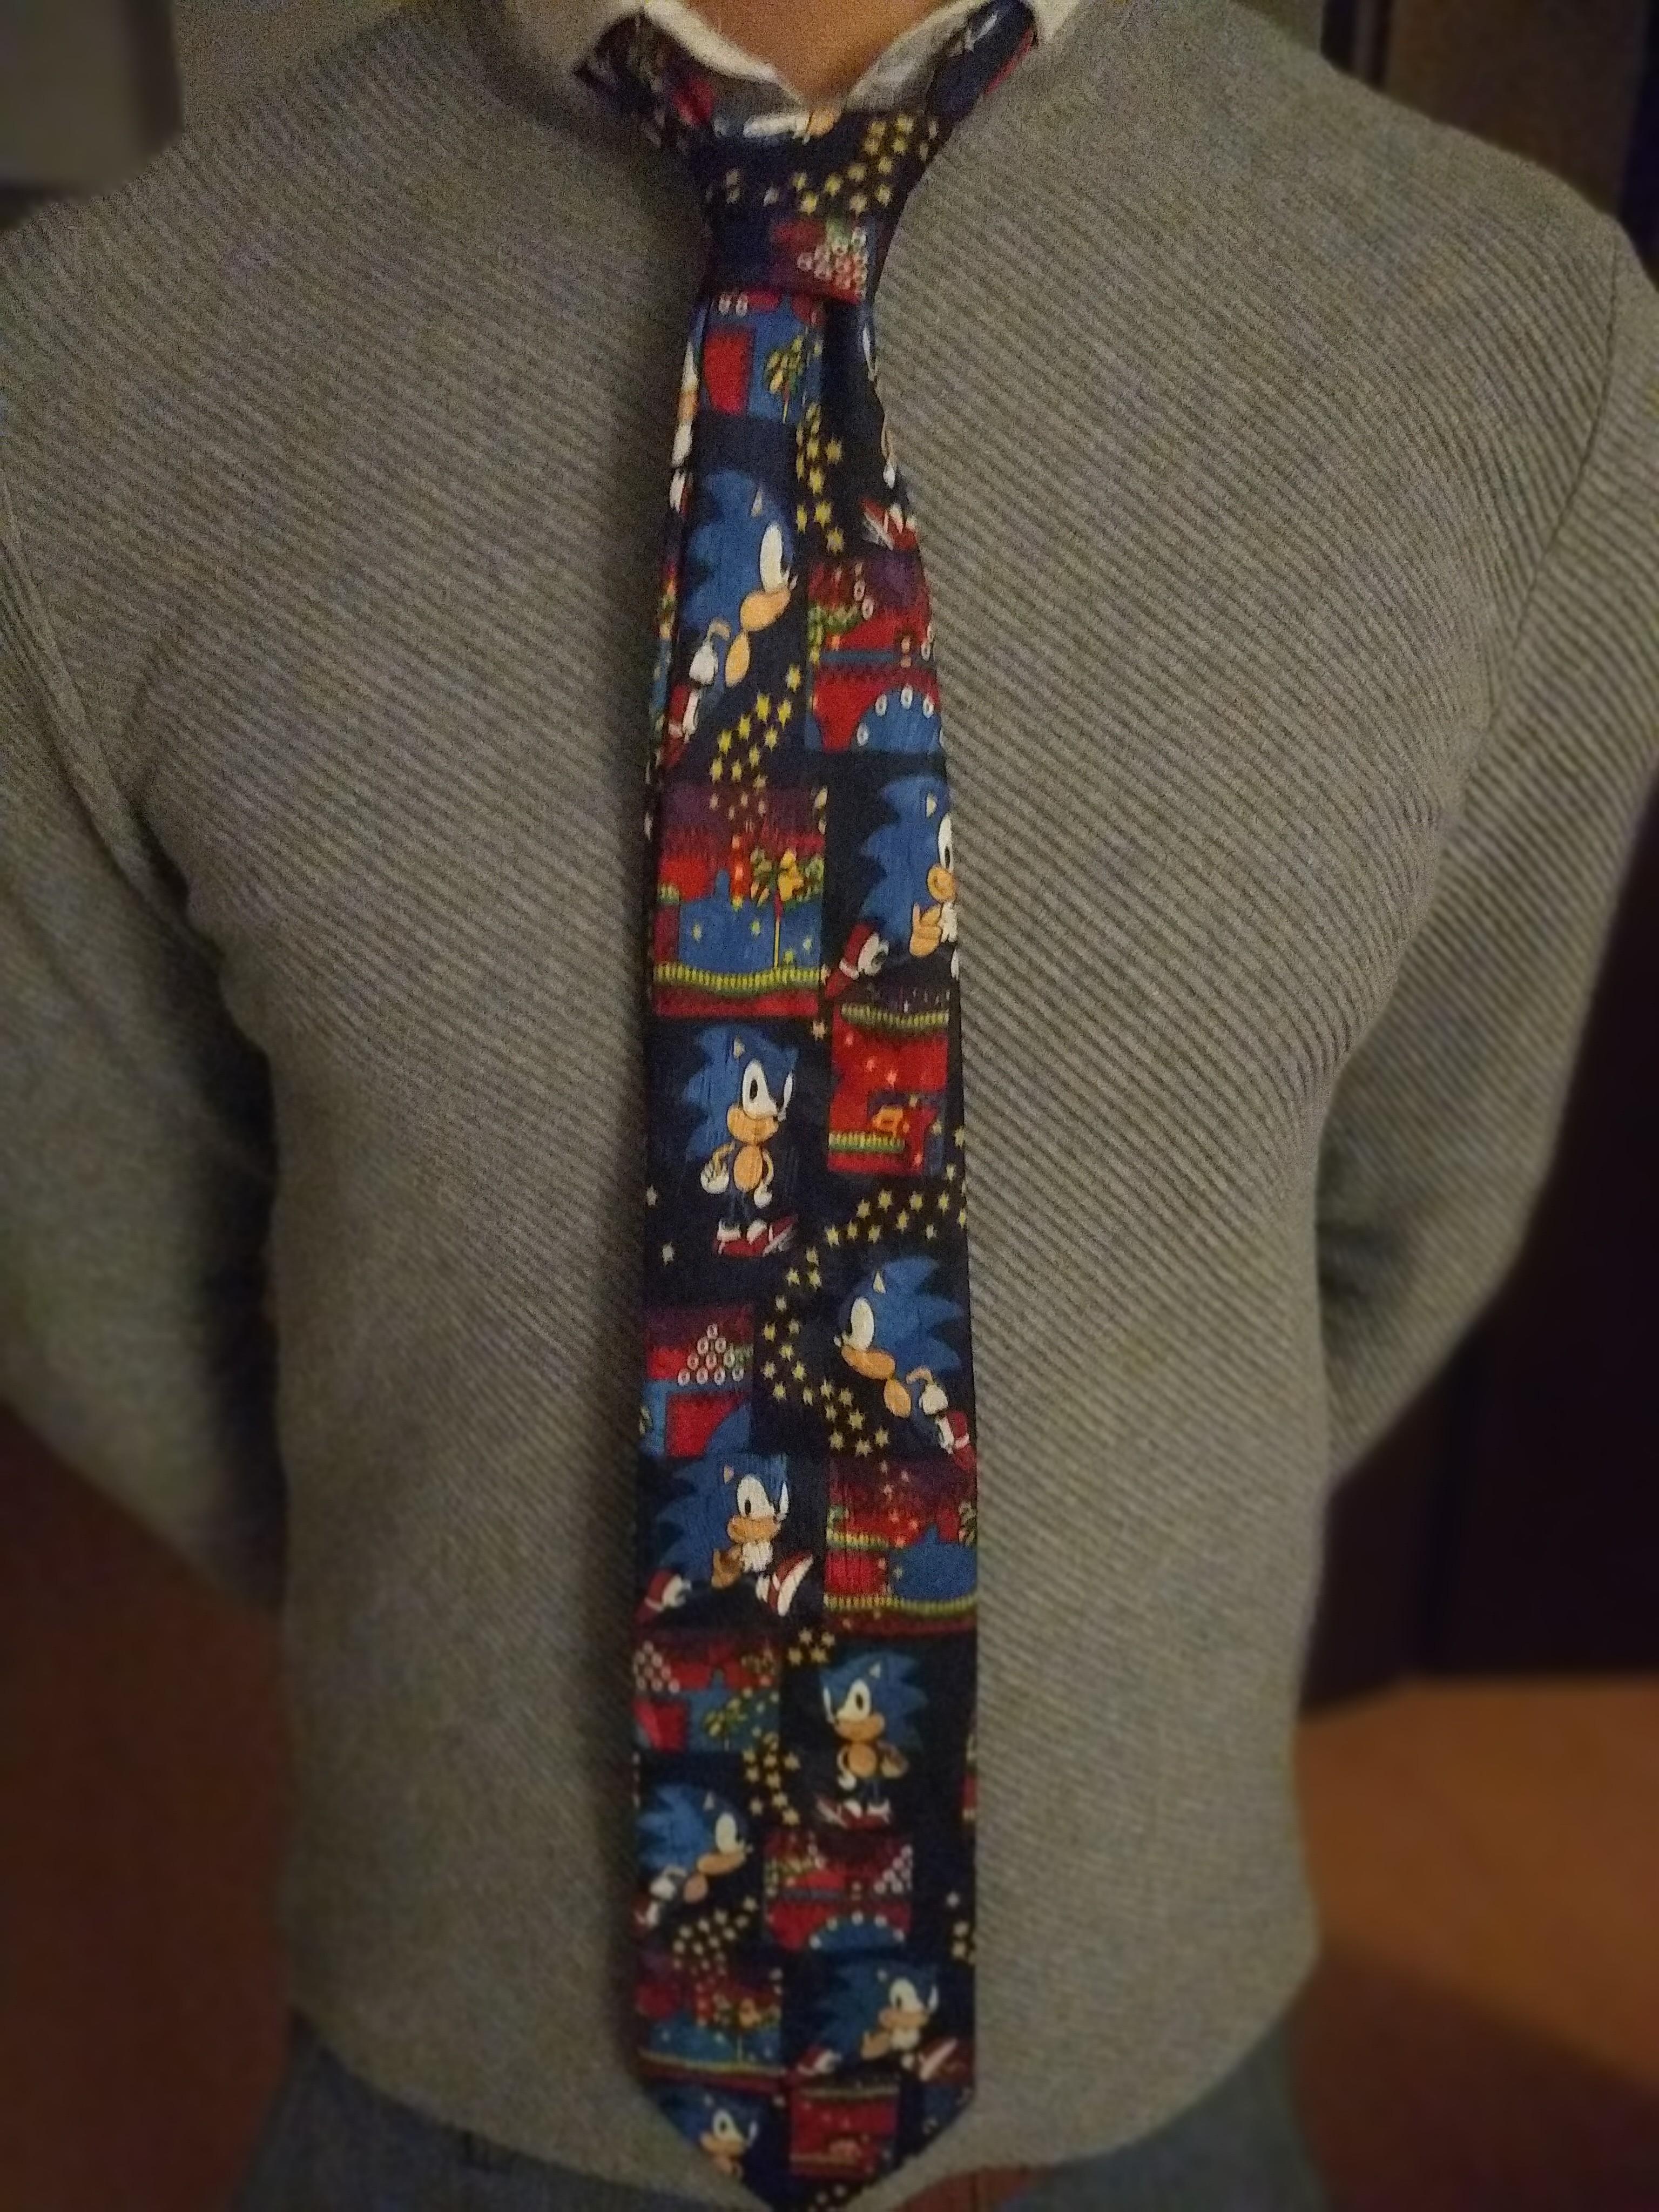 A man in a grey jumper, wearing a Sonic tie.